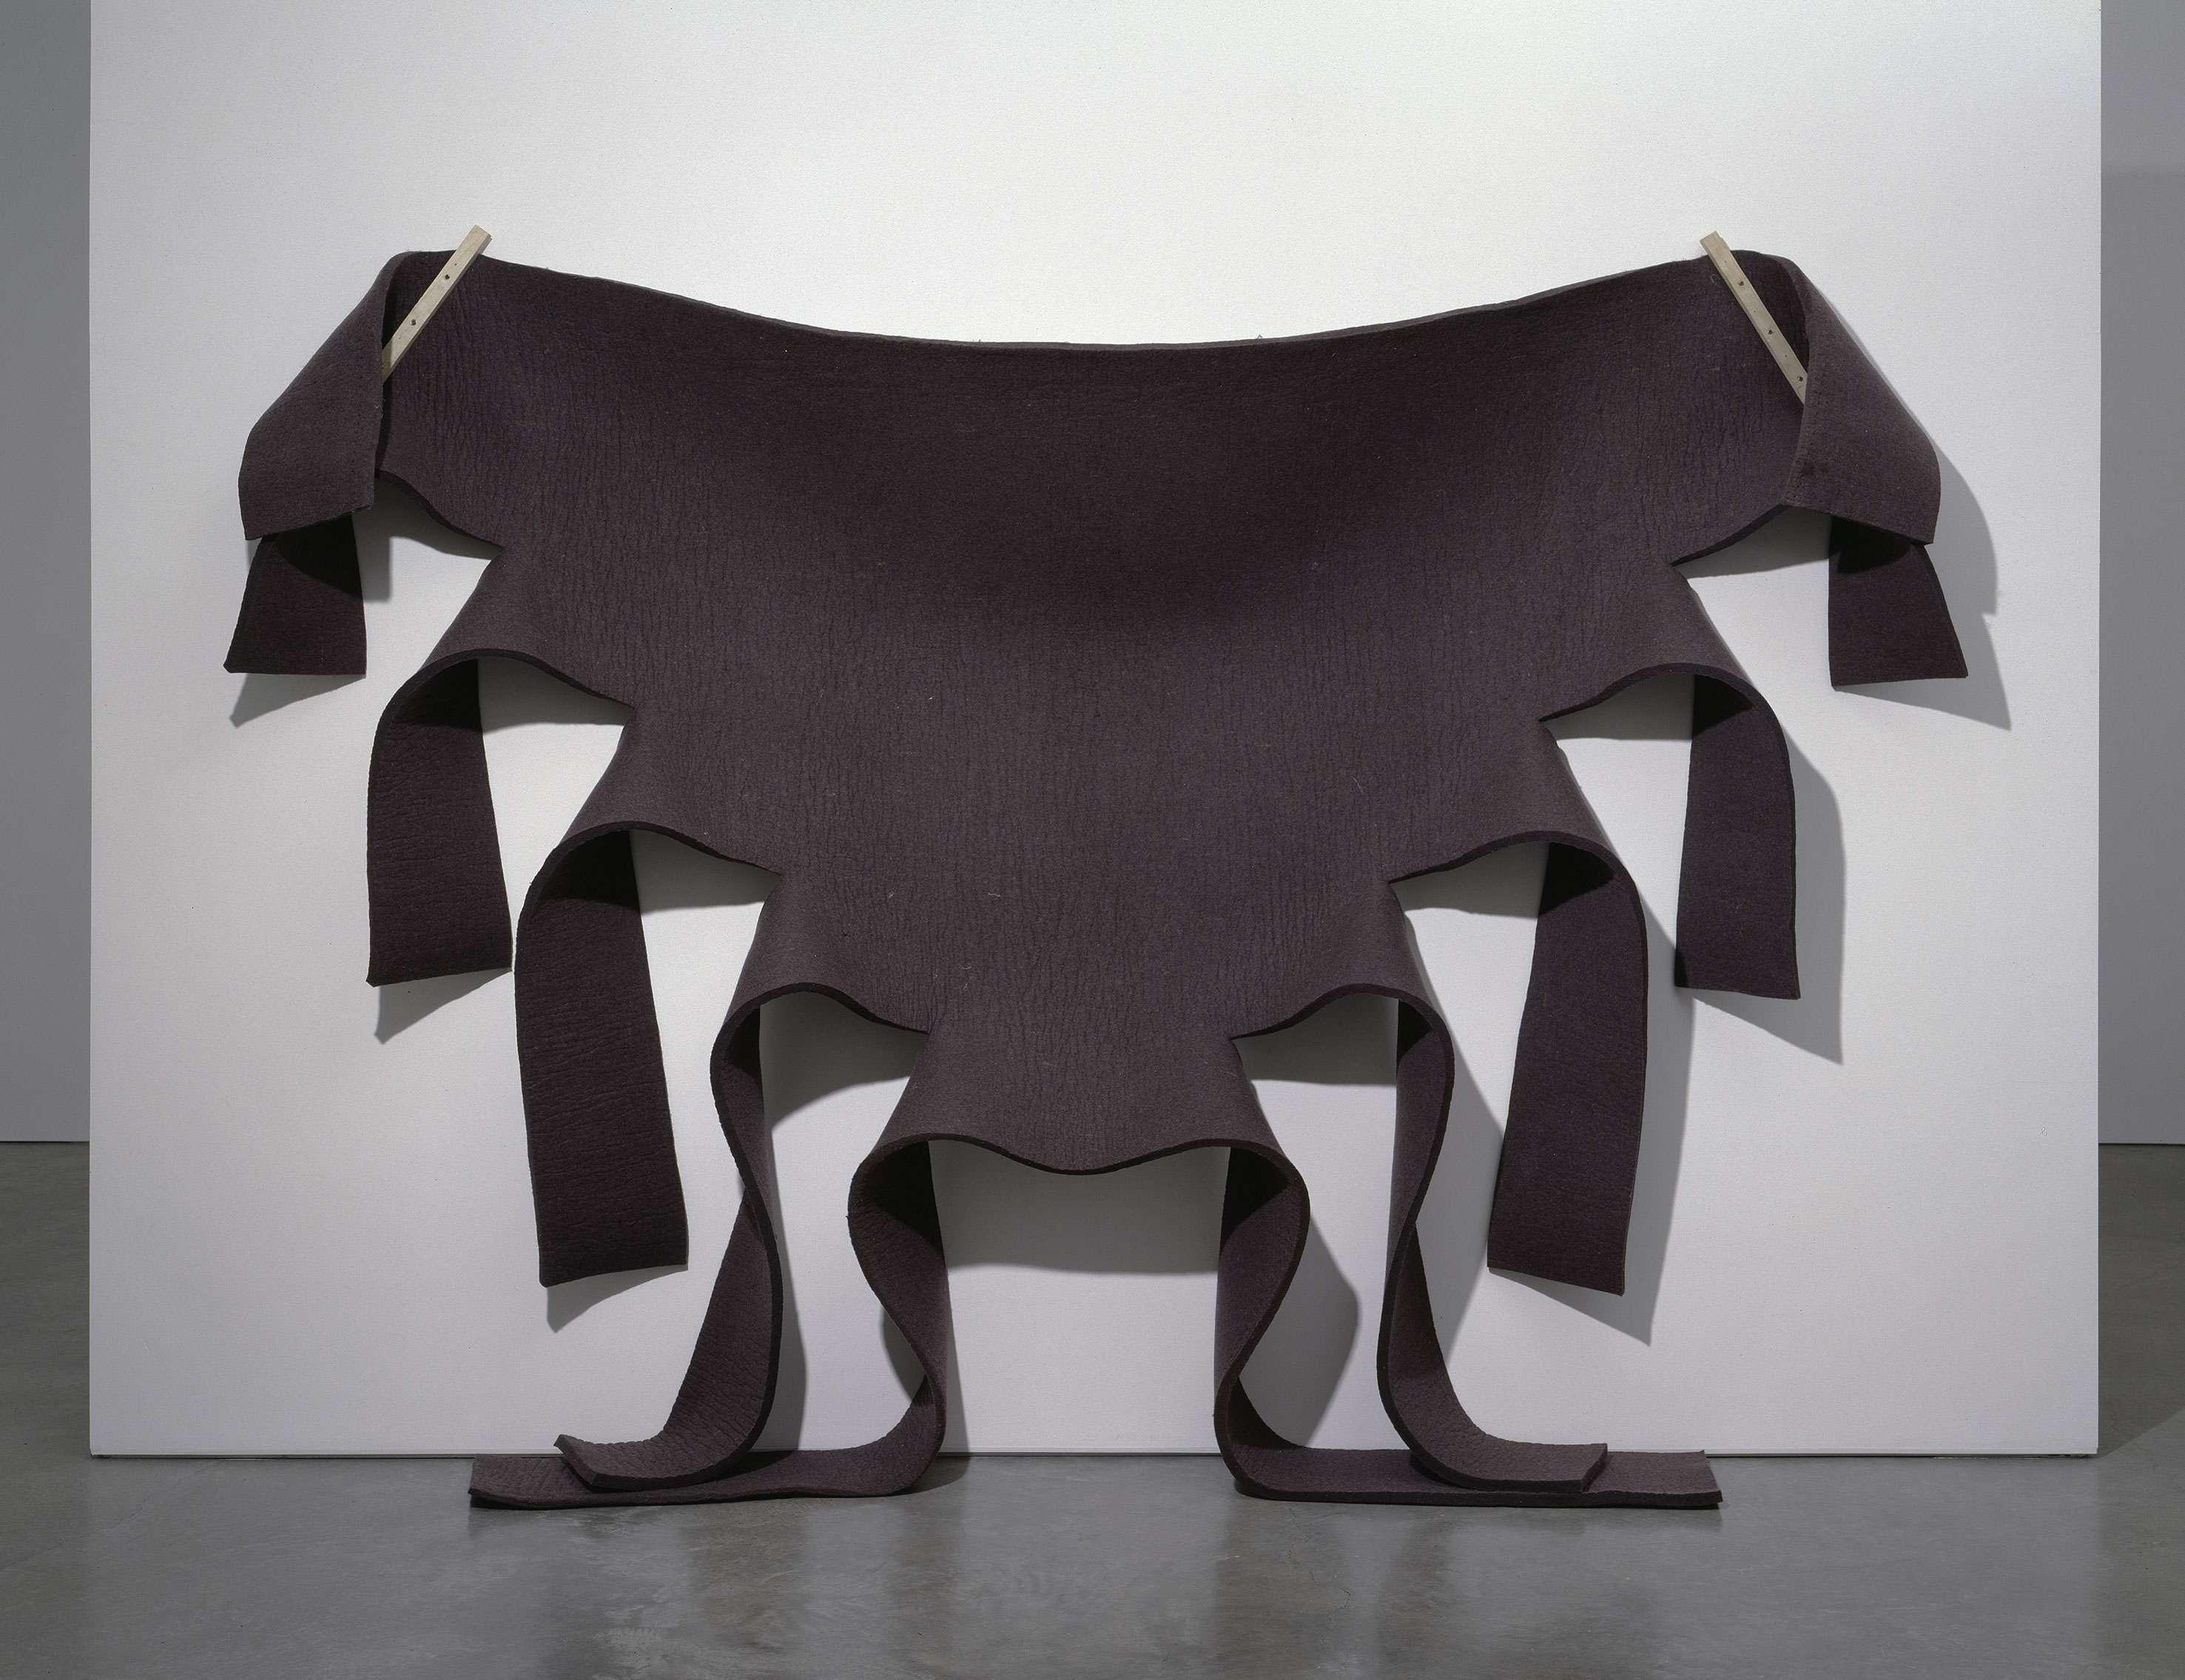 Robert Morris - Untitled (Brown Felt) - 1973